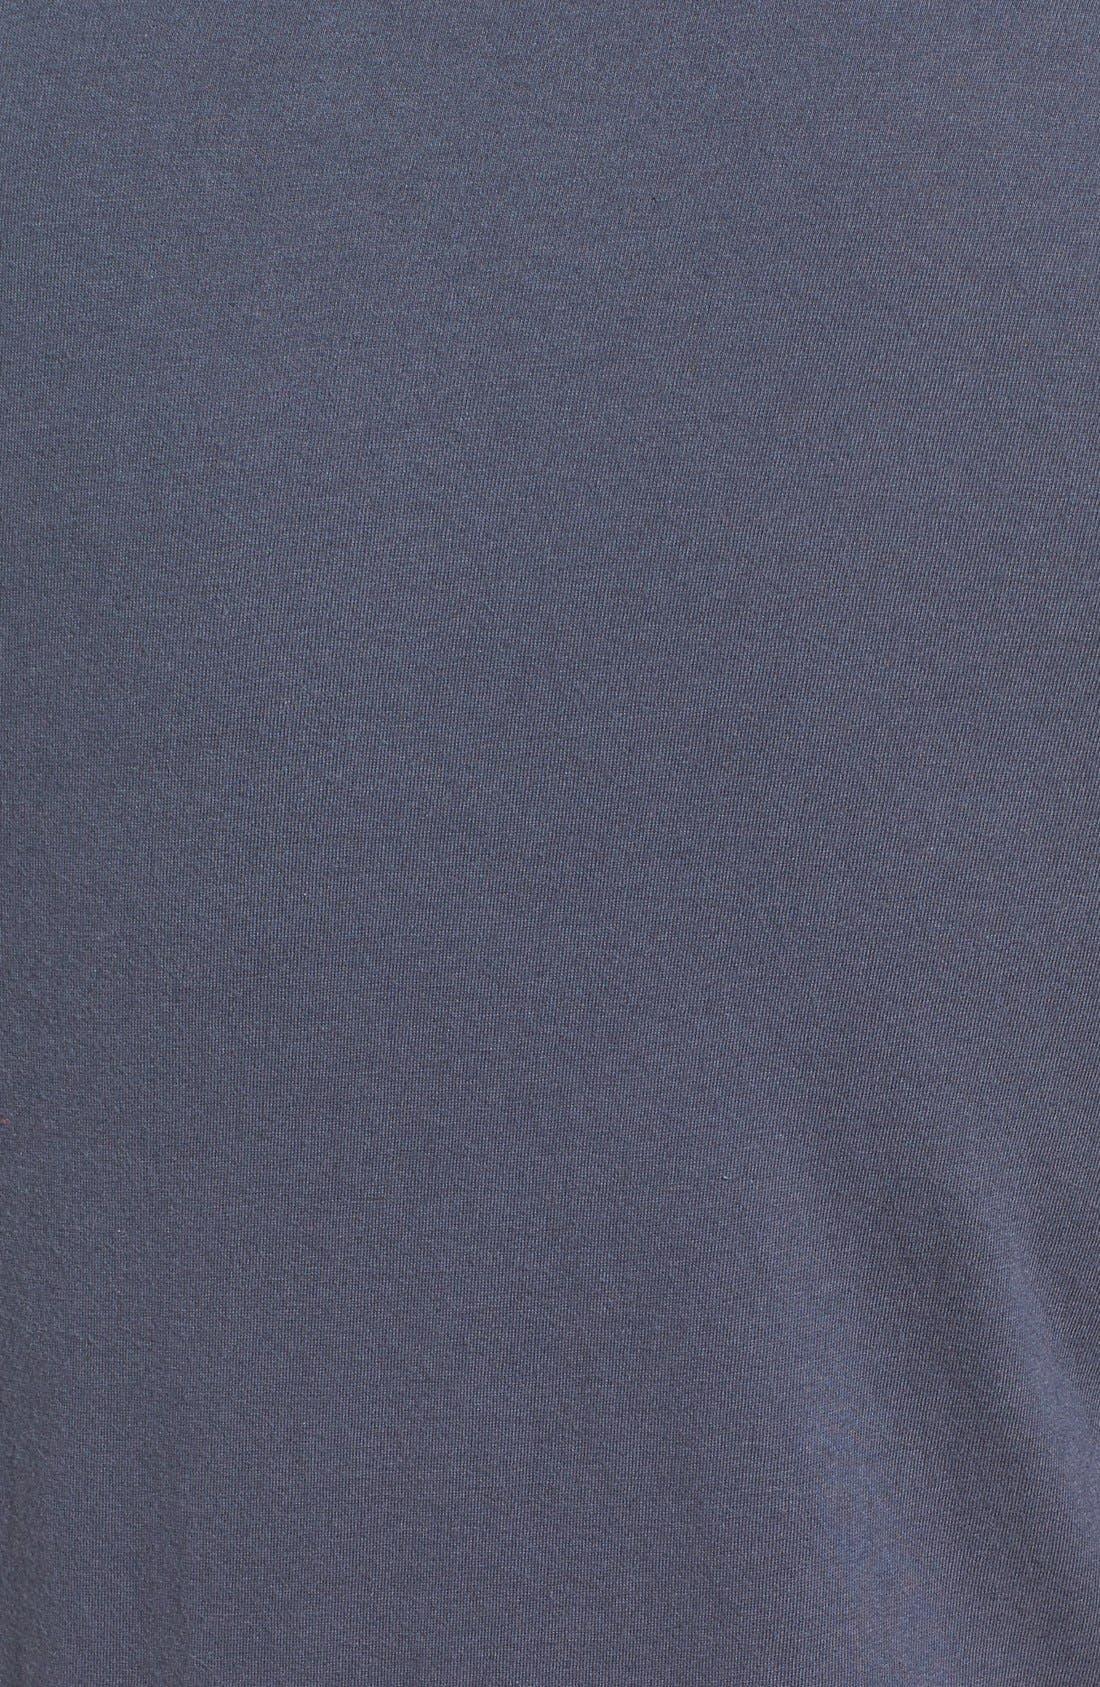 'Los Angeles Angels - Brass Tacks' Trim Fit T-Shirt,                             Alternate thumbnail 5, color,                             410